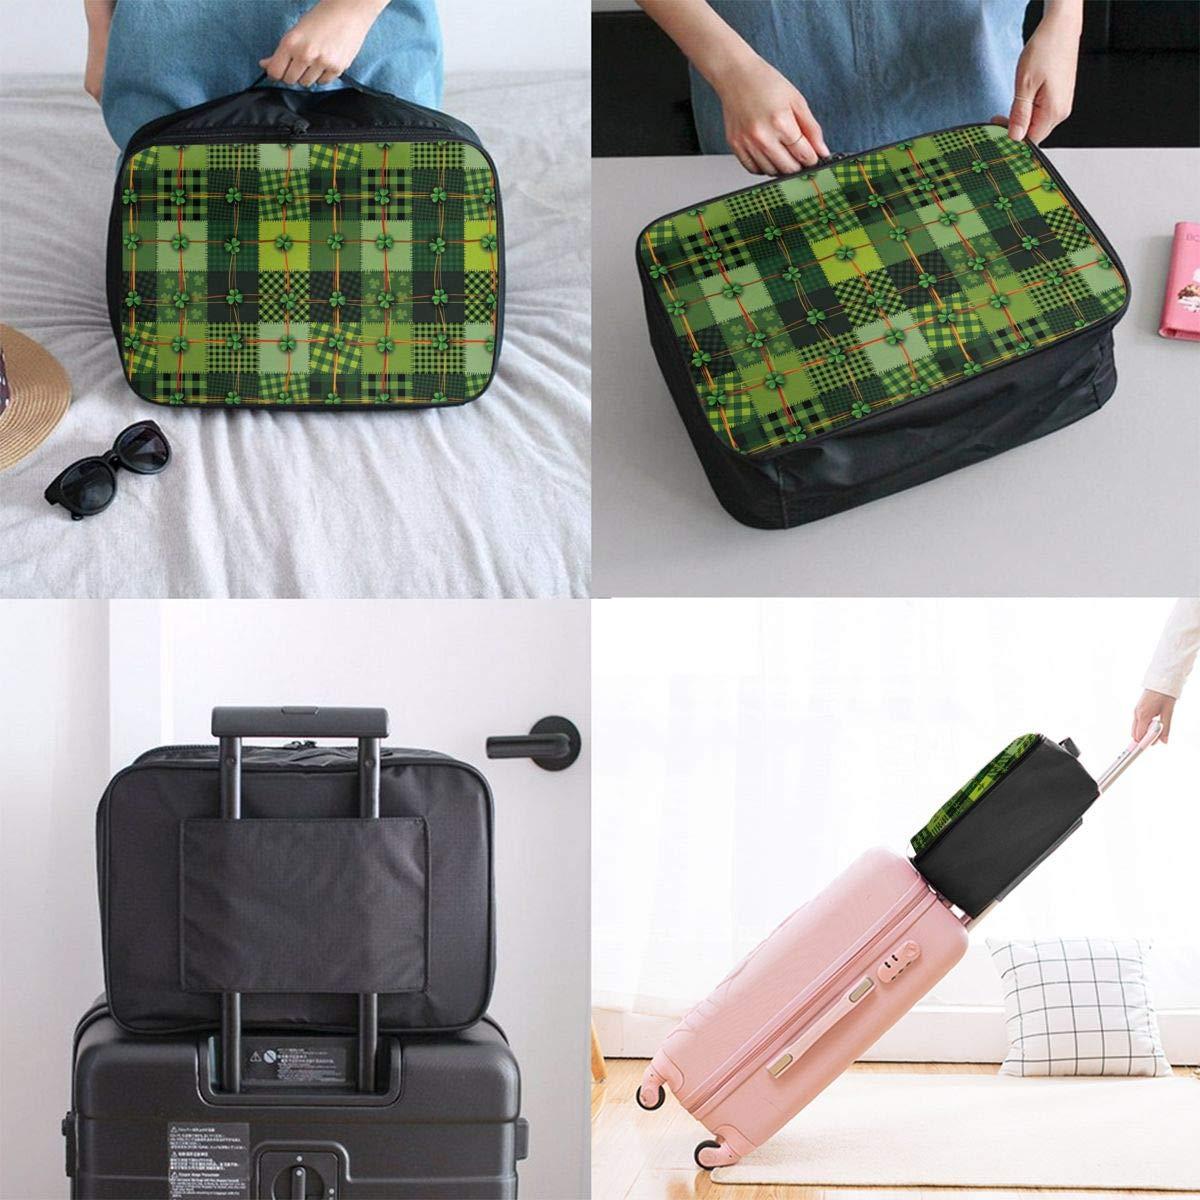 ADGAI Patchwork Style St Canvas Travel Weekender Bag,Fashion Custom Lightweight Large Capacity Portable Luggage Bag,Suitcase Trolley Bag